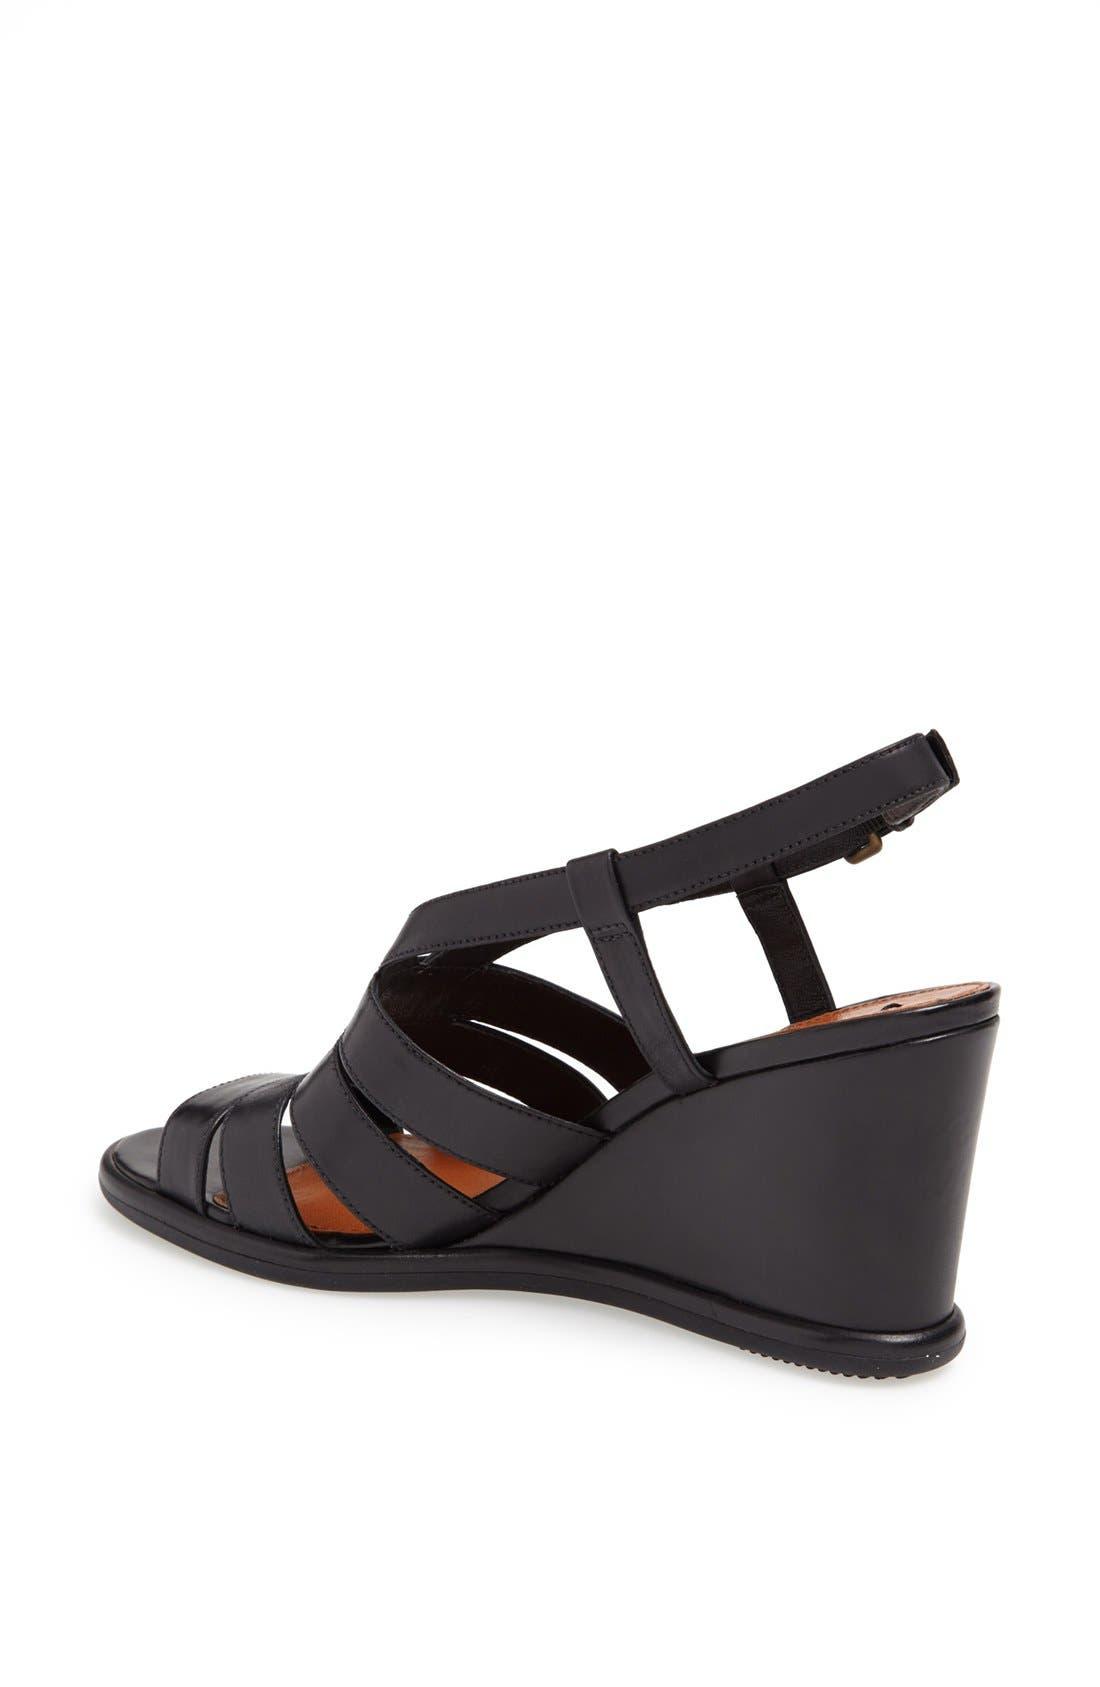 Alternate Image 2  - Via Spiga 'Damara' Wedge Sandal